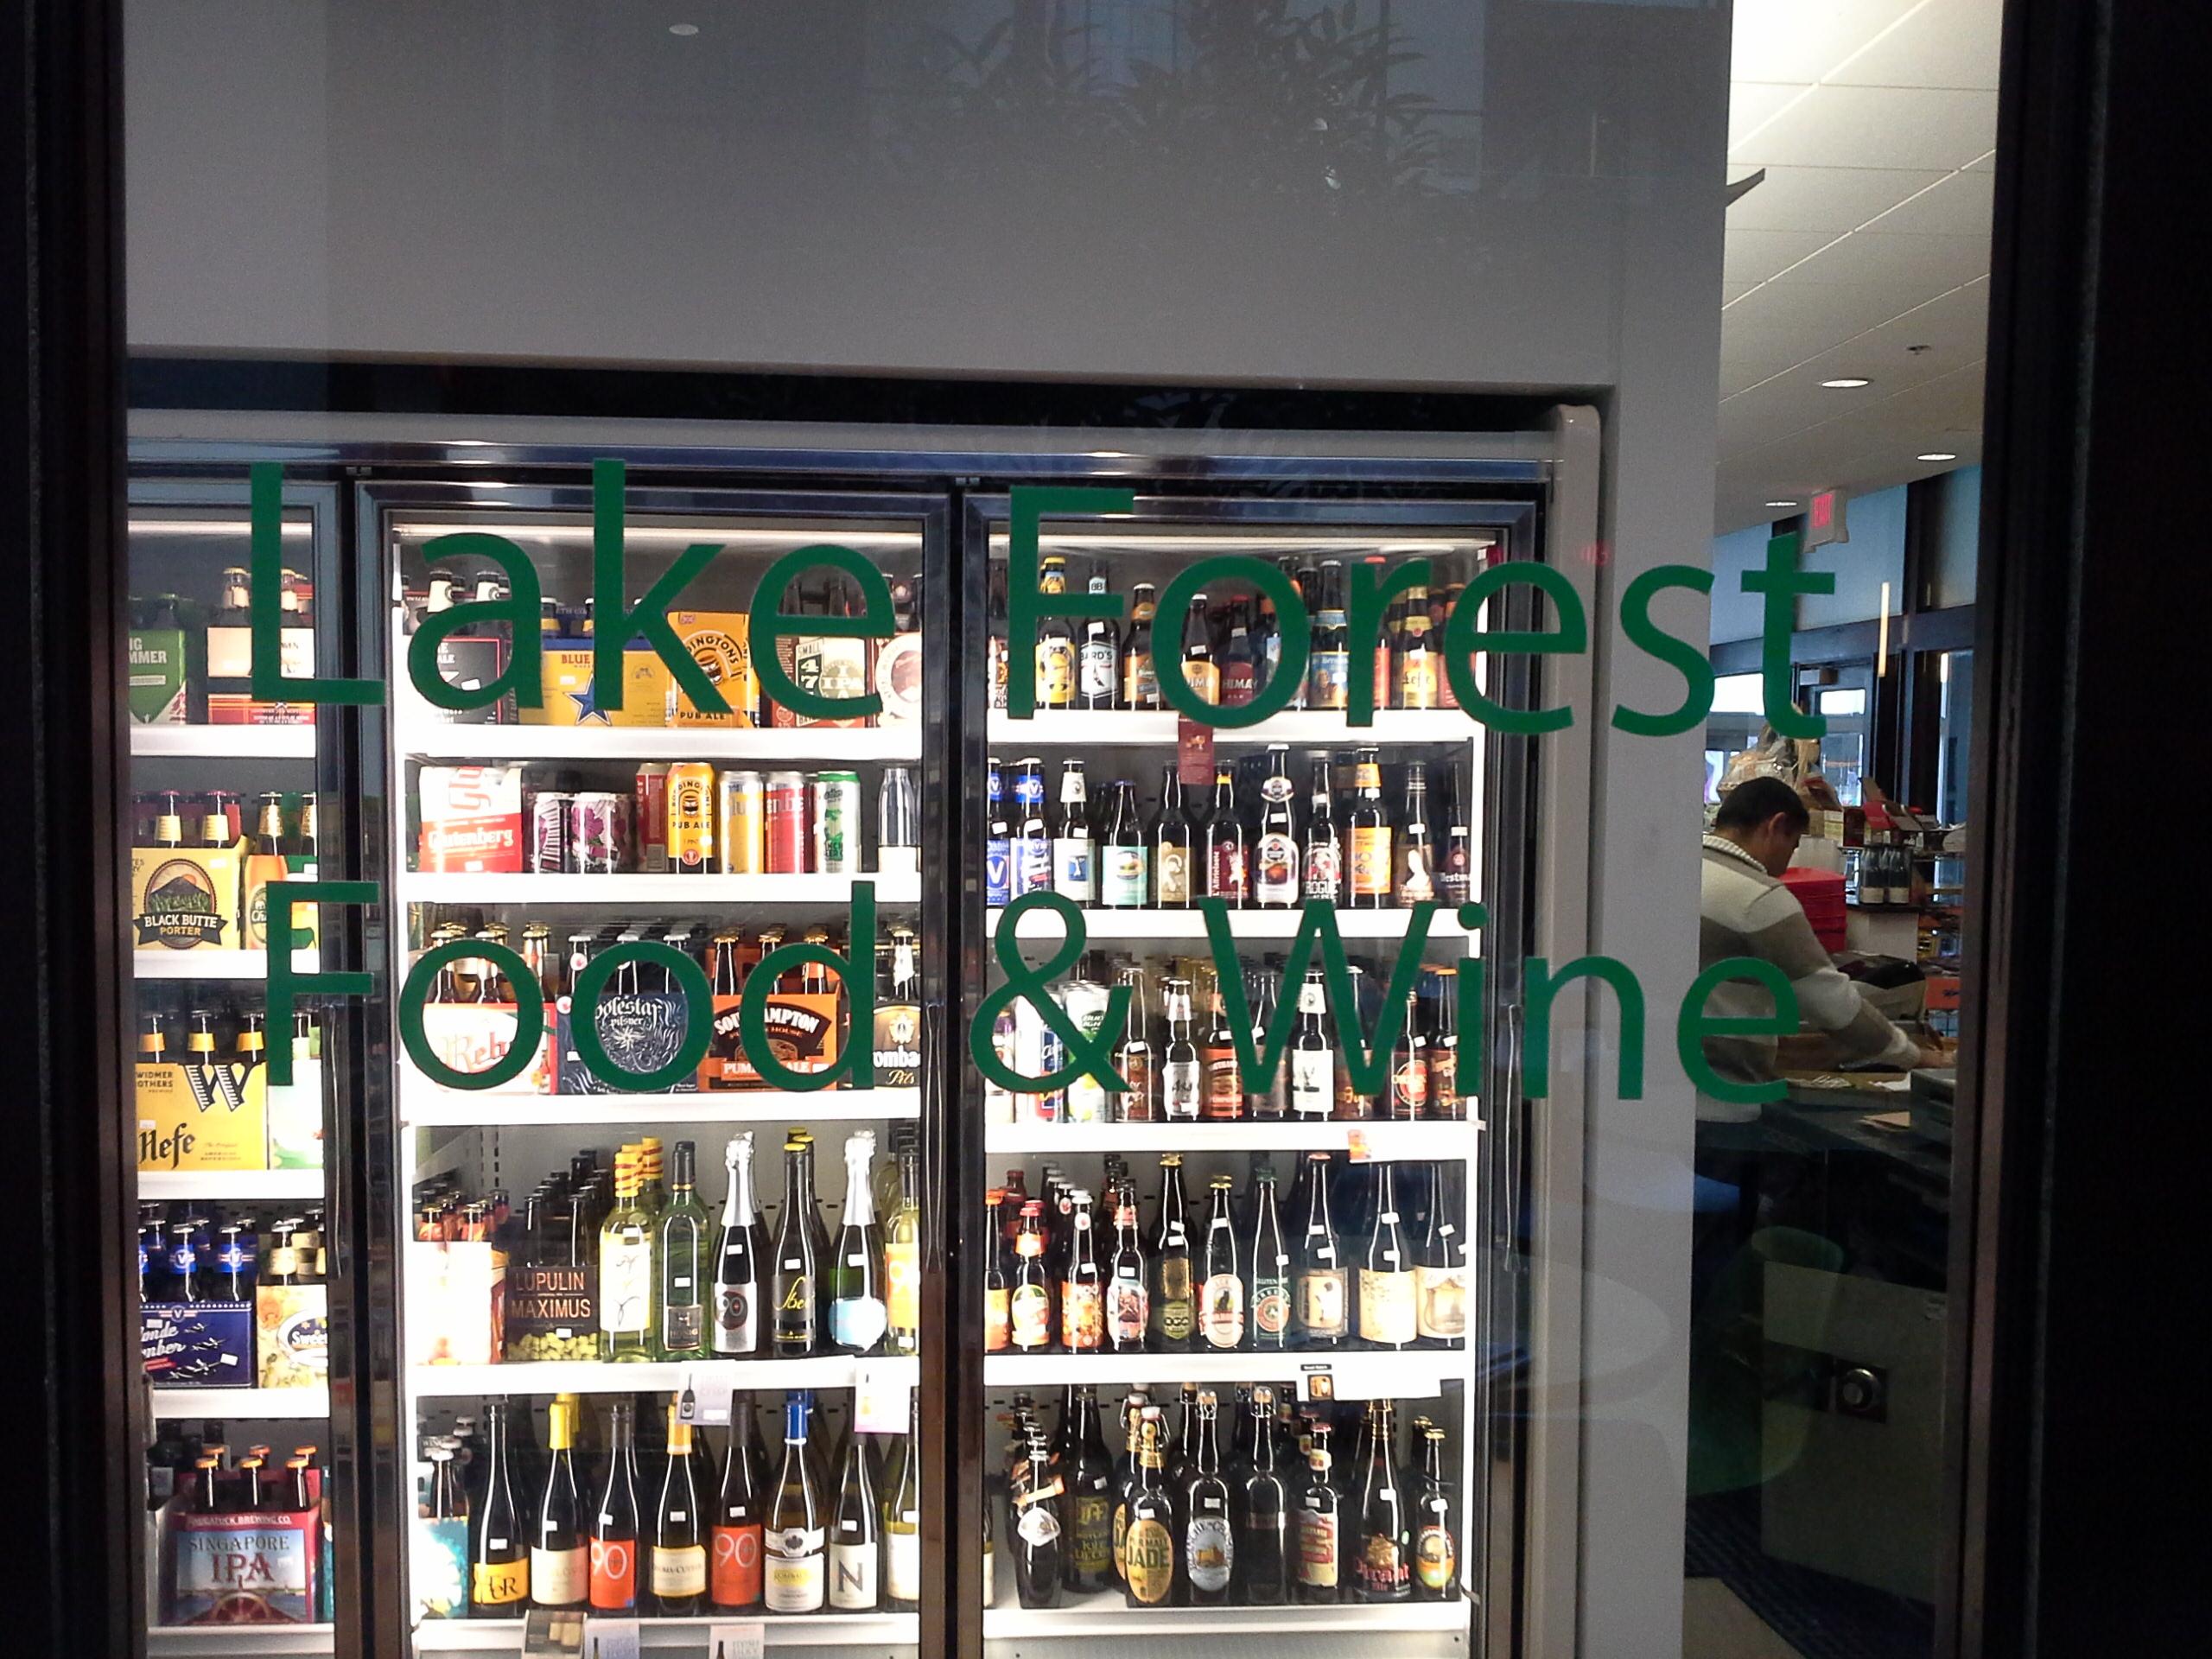 Lake Forest Food & Wine image 8